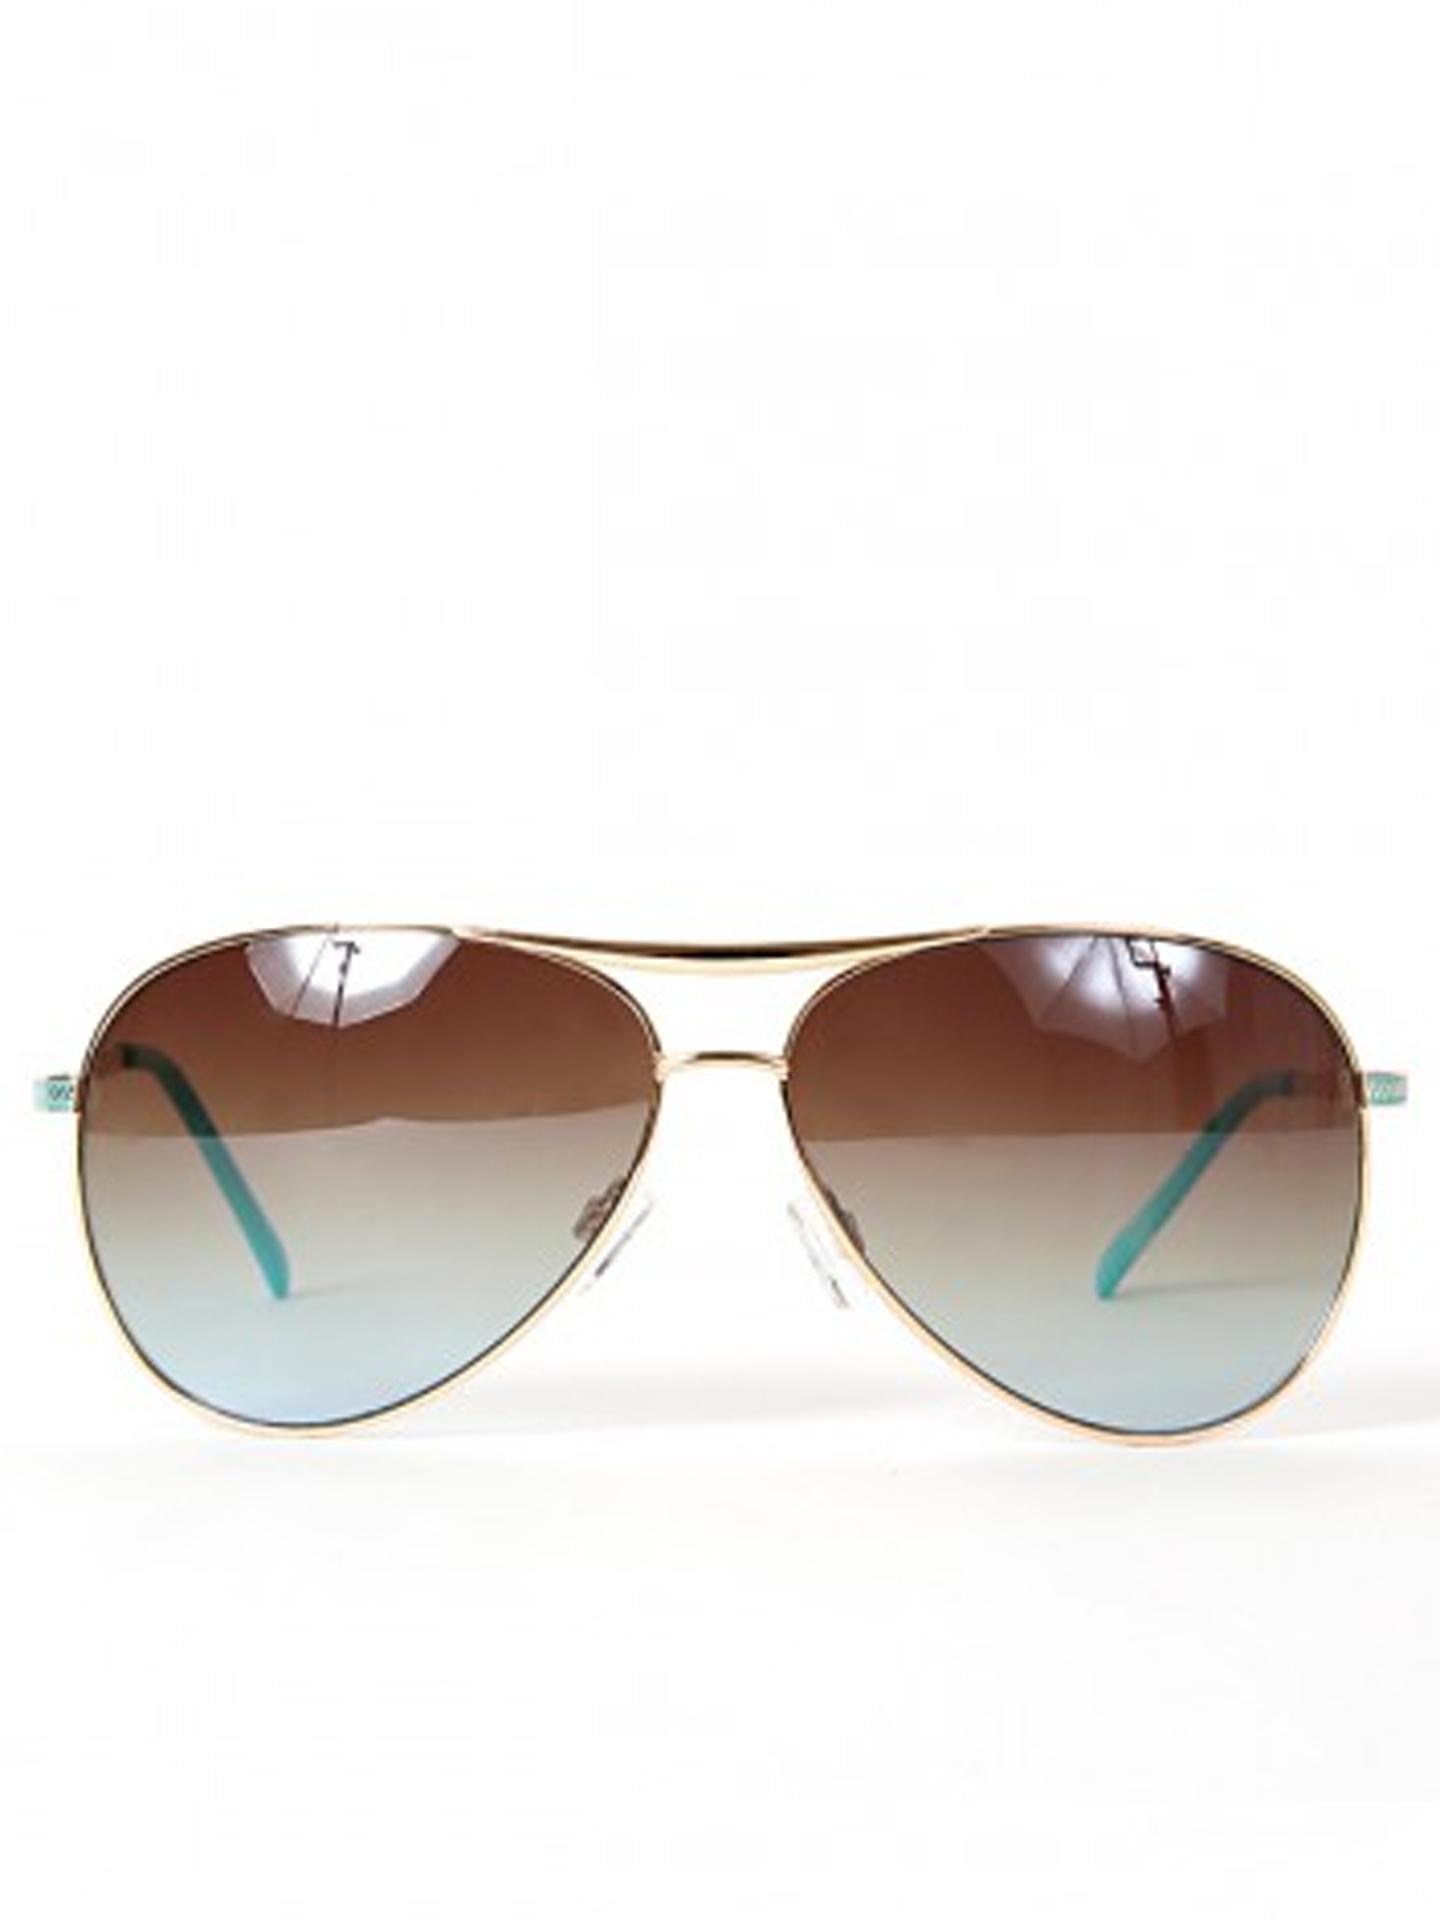 sunglasses face shape tips